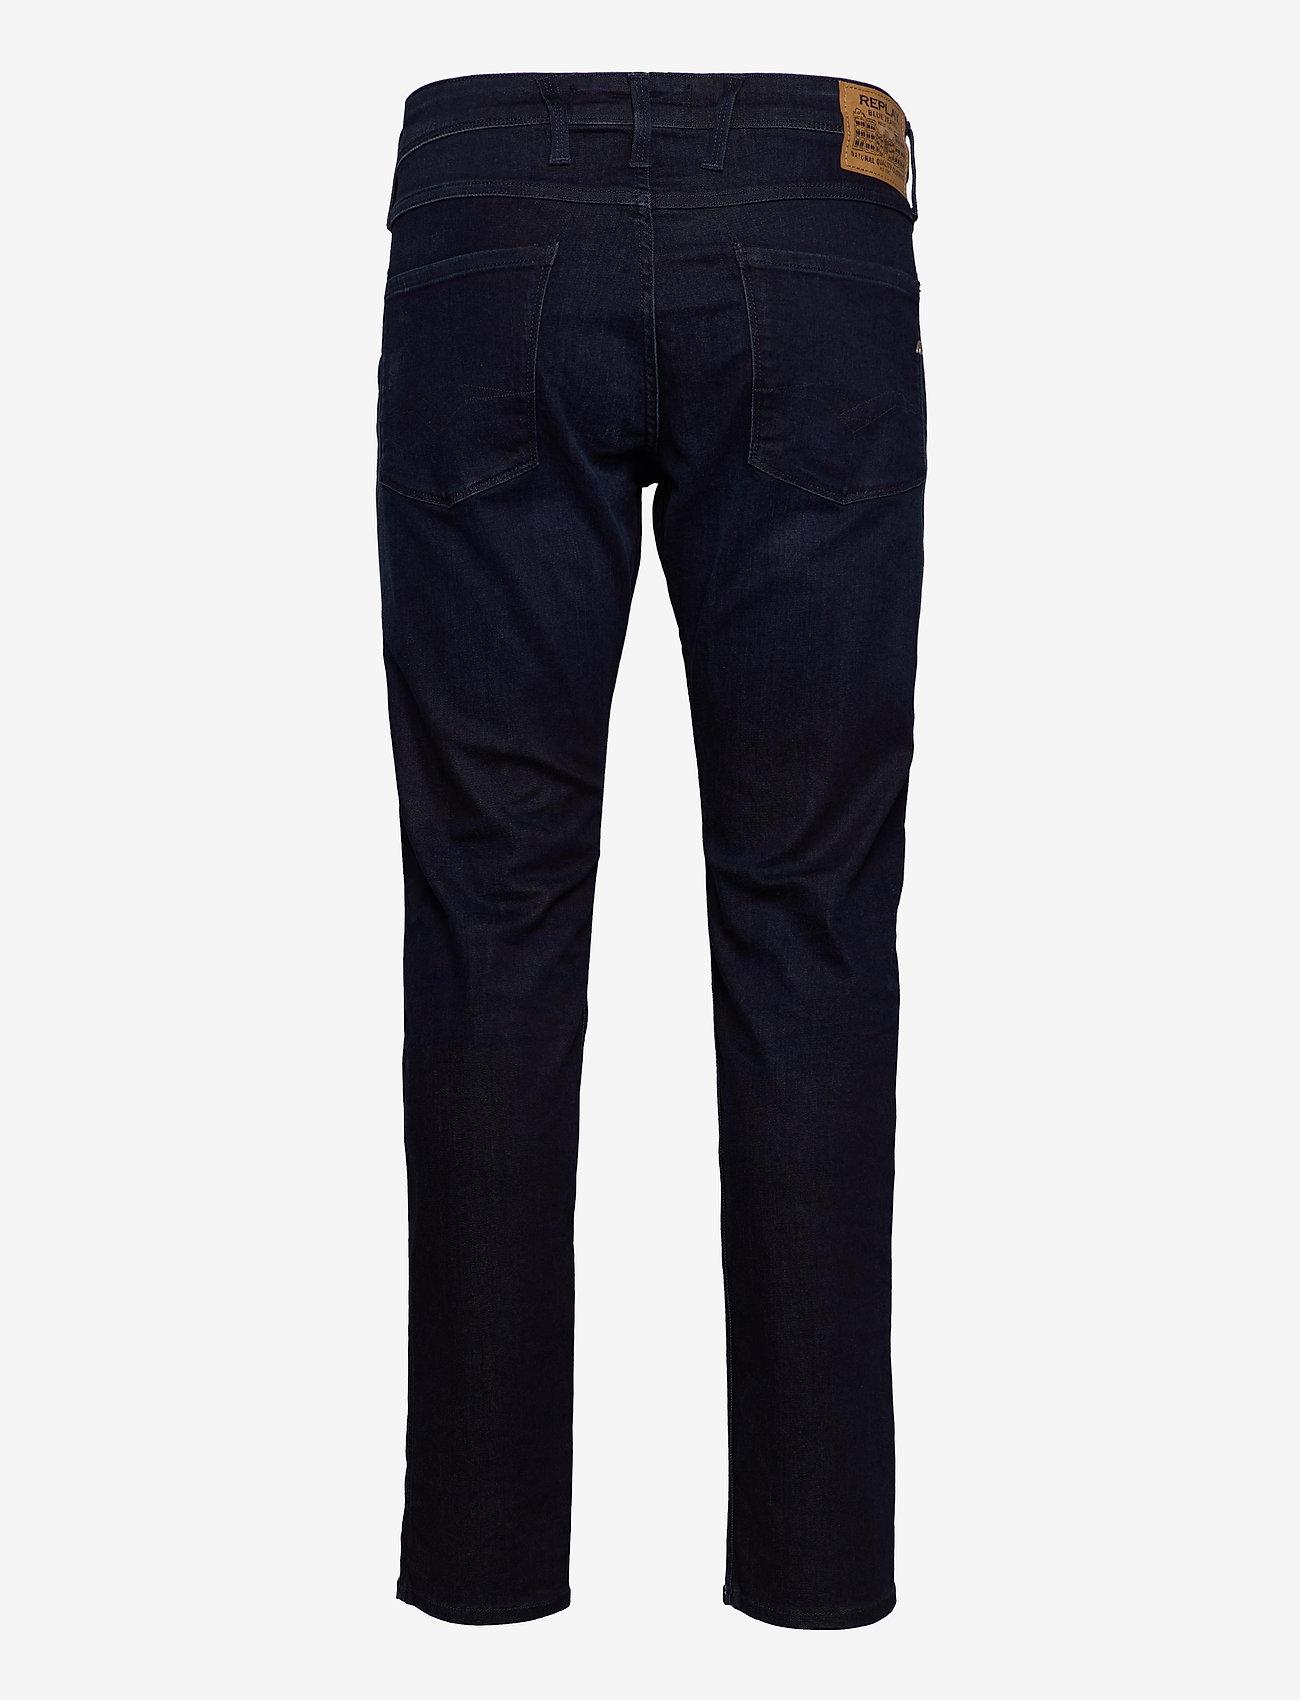 Replay - ANBASS - slim jeans - dark blue - 1